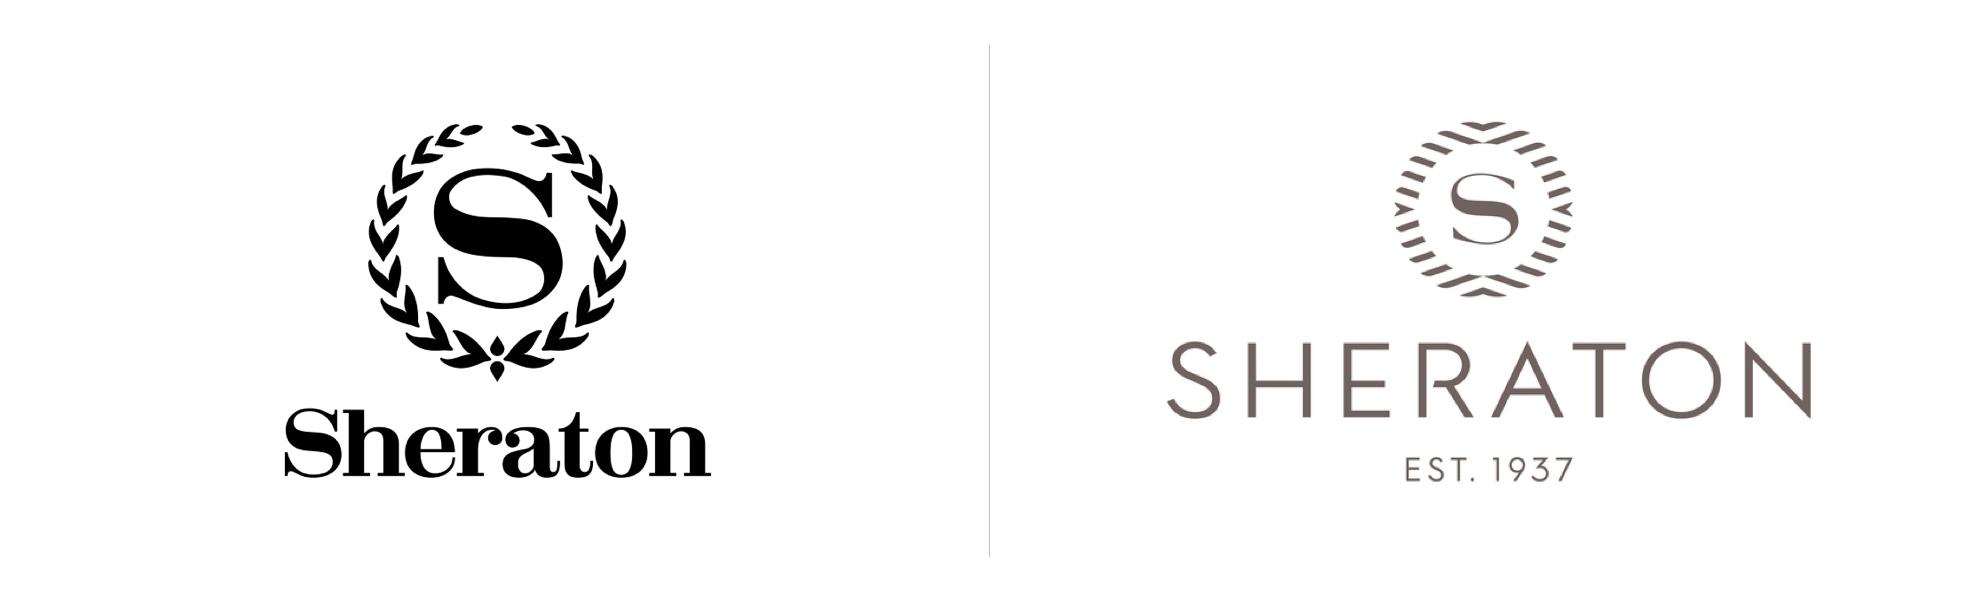 Sheraton zmienia logo